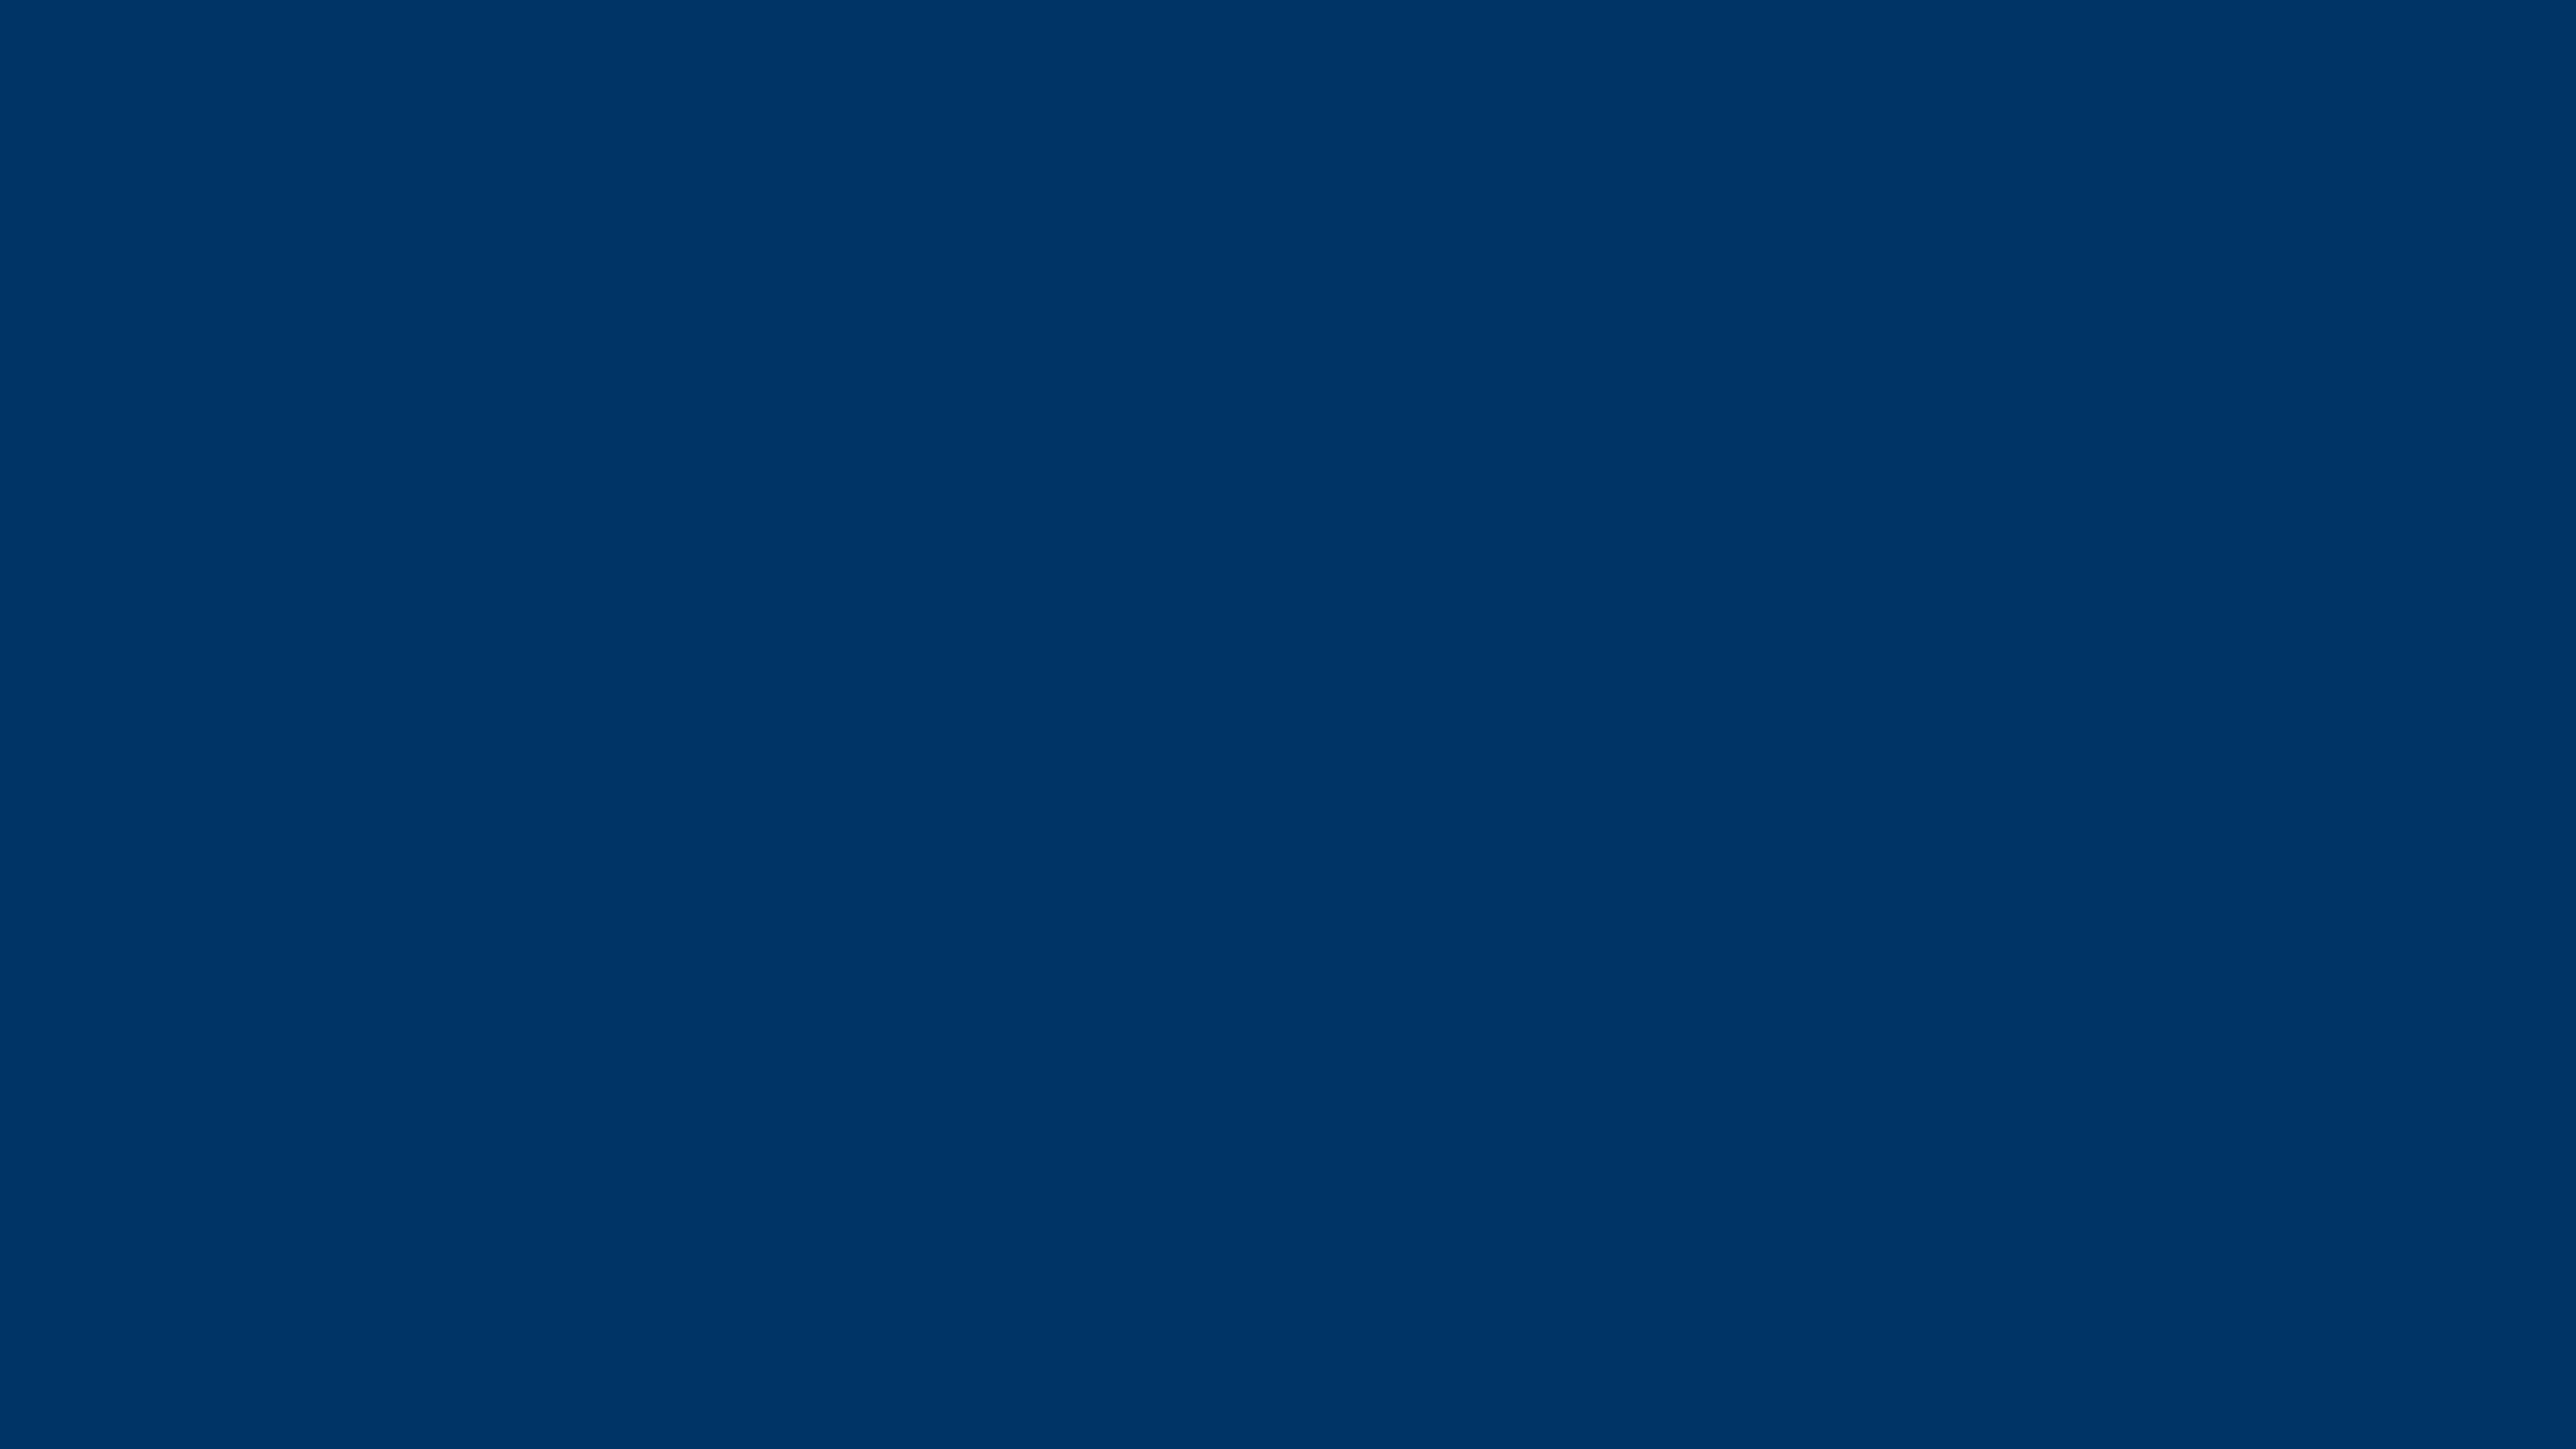 4096x2304 Dark Midnight Blue Solid Color Background